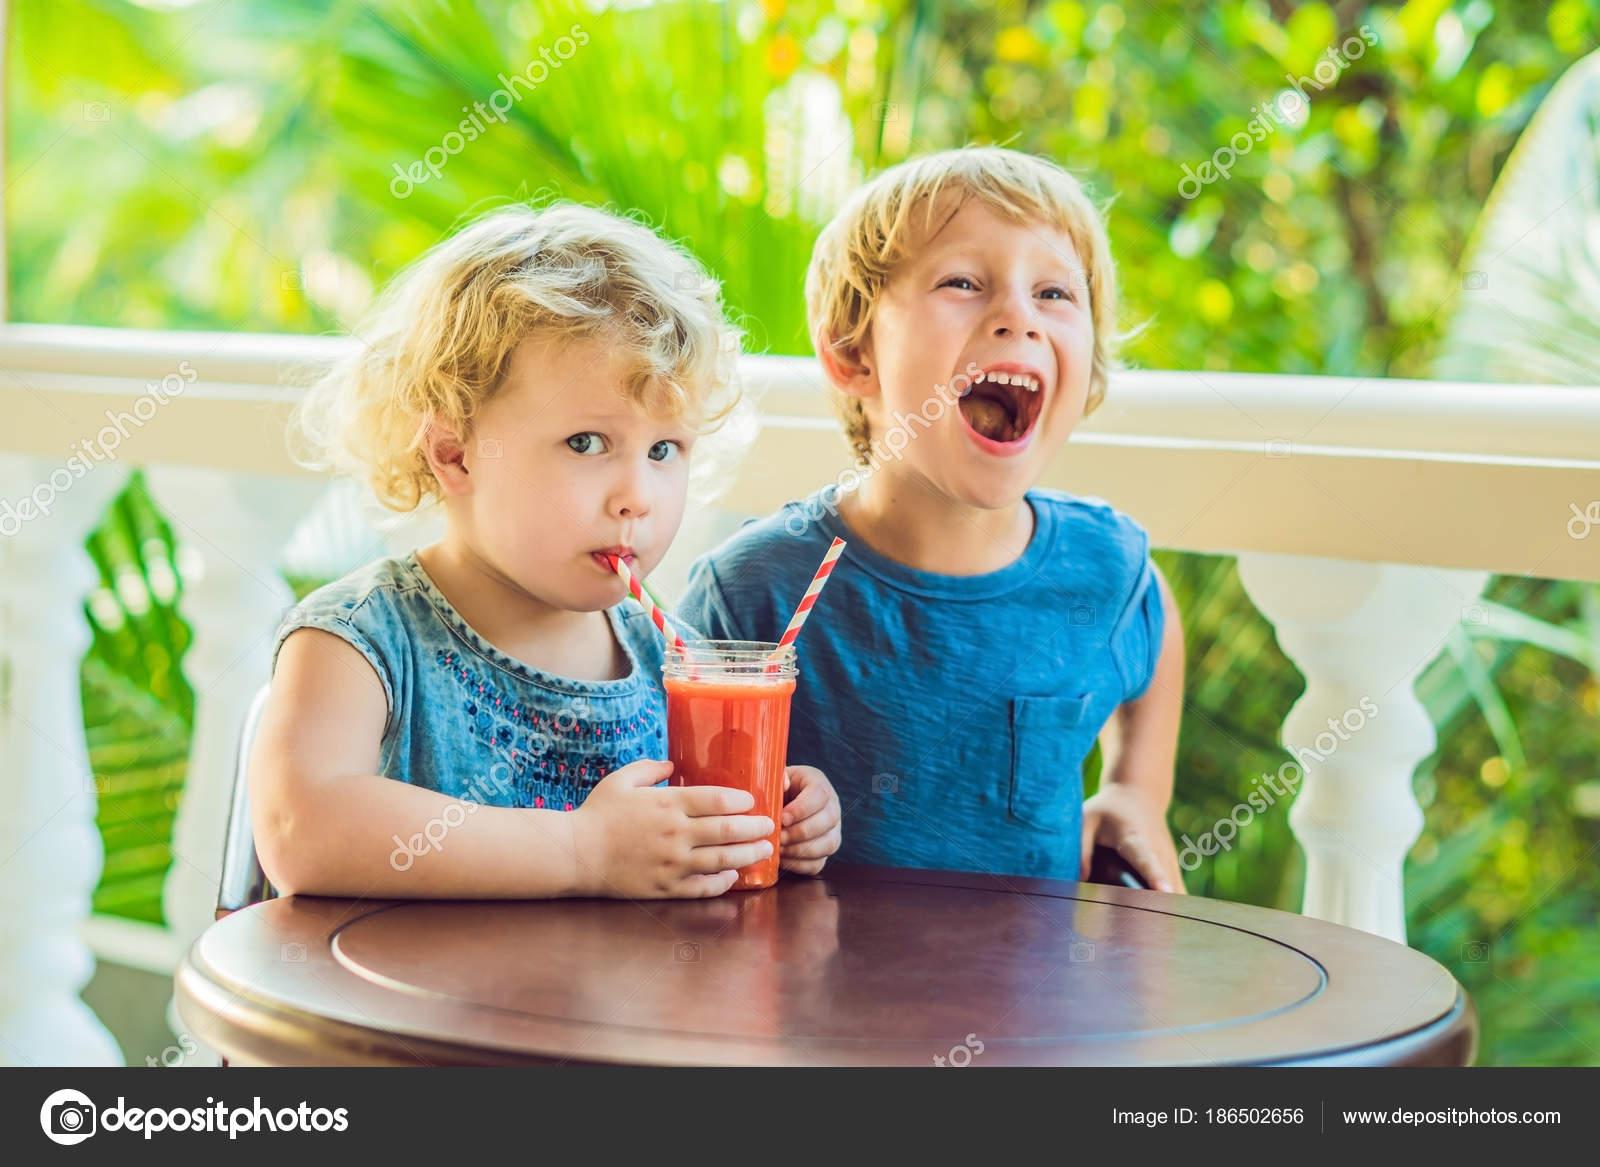 43014cd6aa4 Αγόρι Και Κορίτσι Smoothie Ποτό Πορτοκαλί Παιδιά Από Παπάγια ...